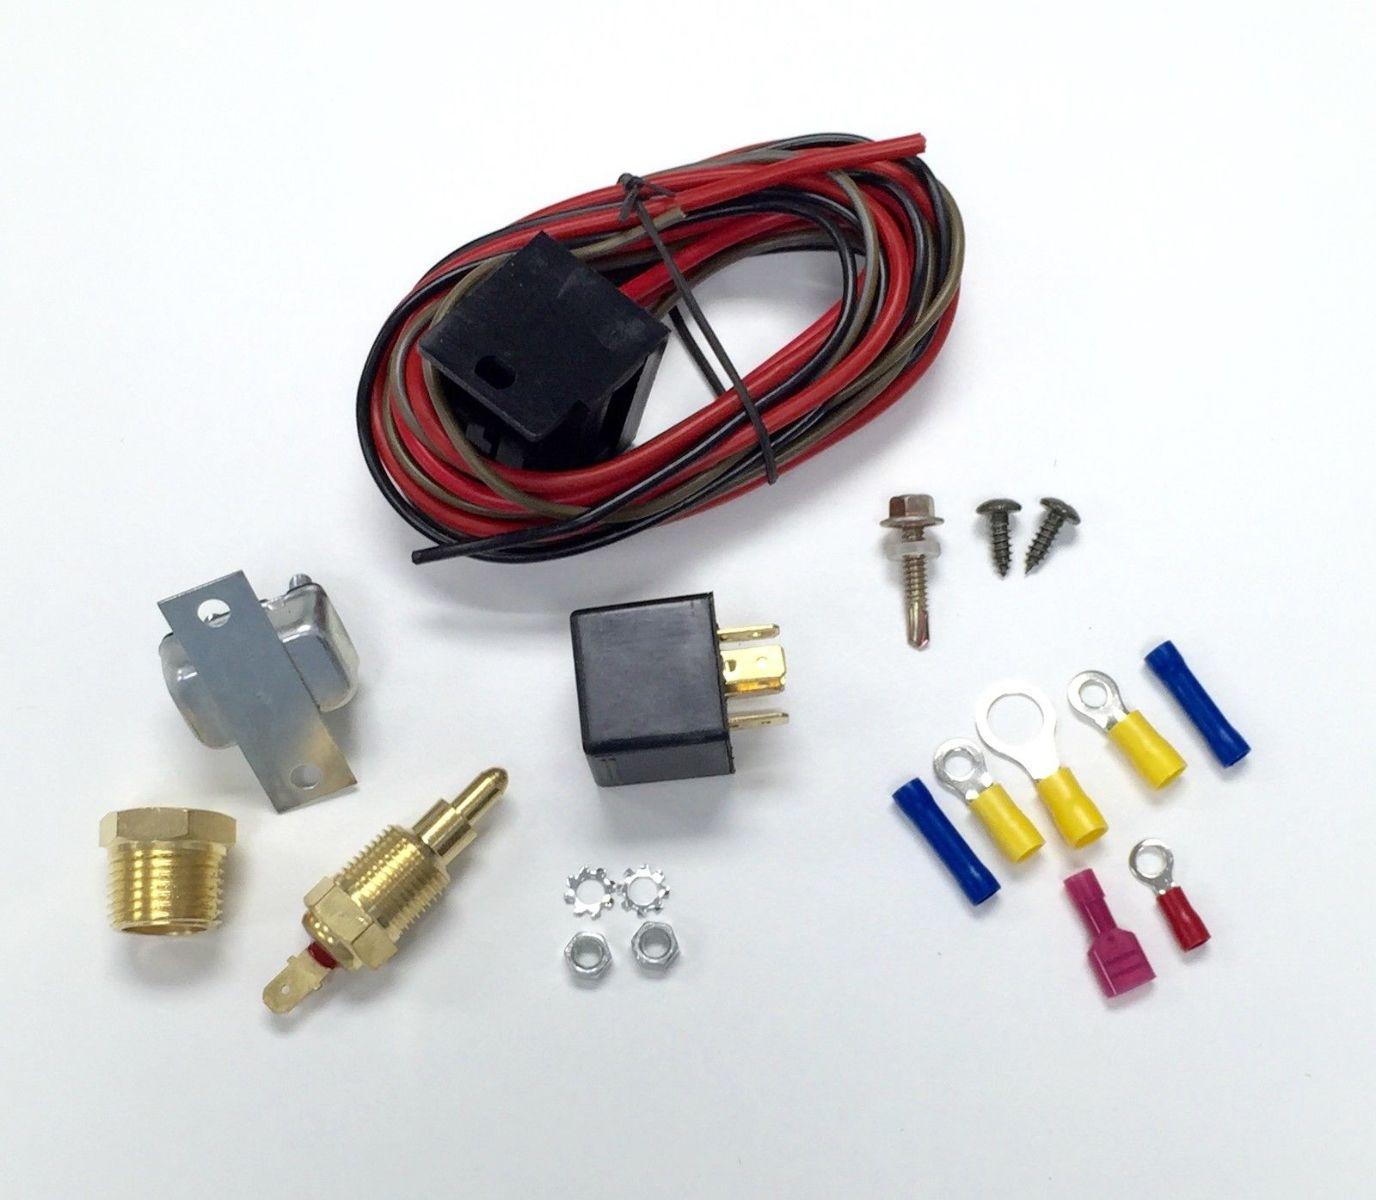 Amp Relay Wiring Box on bosch 24v, 2 pole solid state, 5 pin 12 vdc, bitron 12v, 12v 4 prong, standard part number, bosch 12v, diode 4 prong,